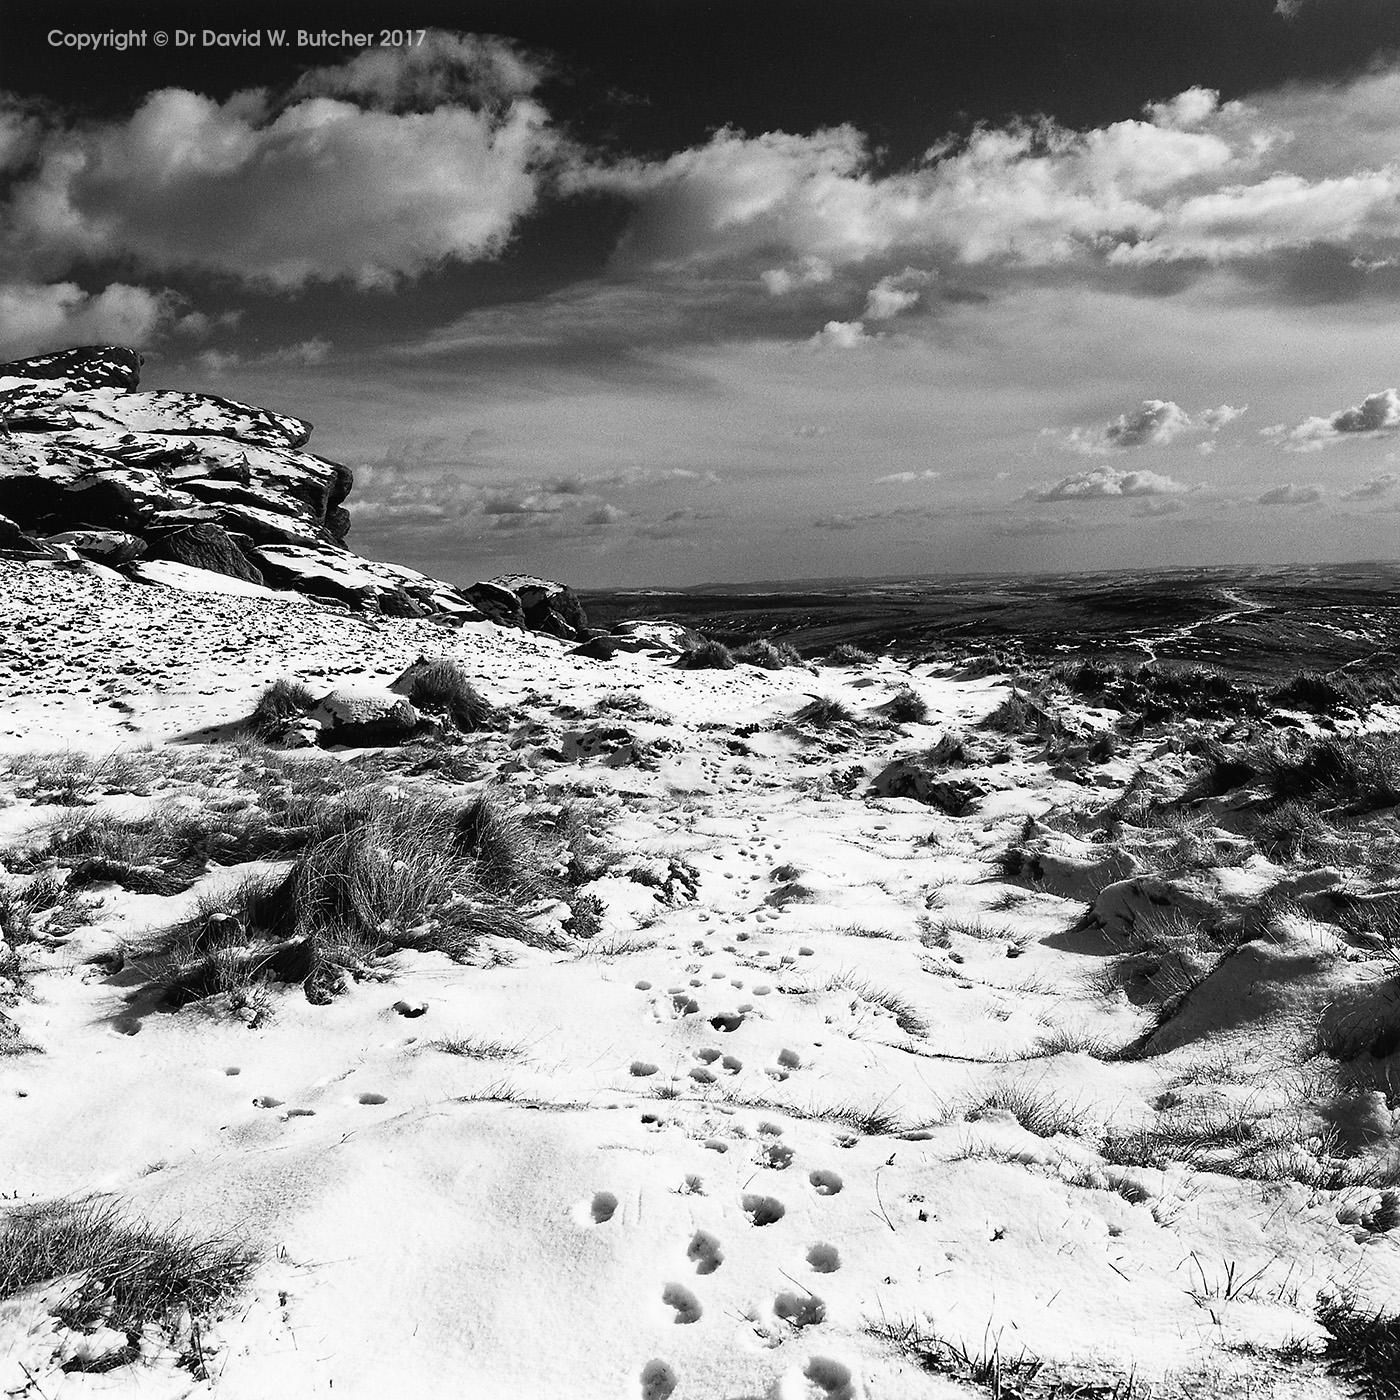 Hare Tracks on Kinderscout, Edale, Peak District